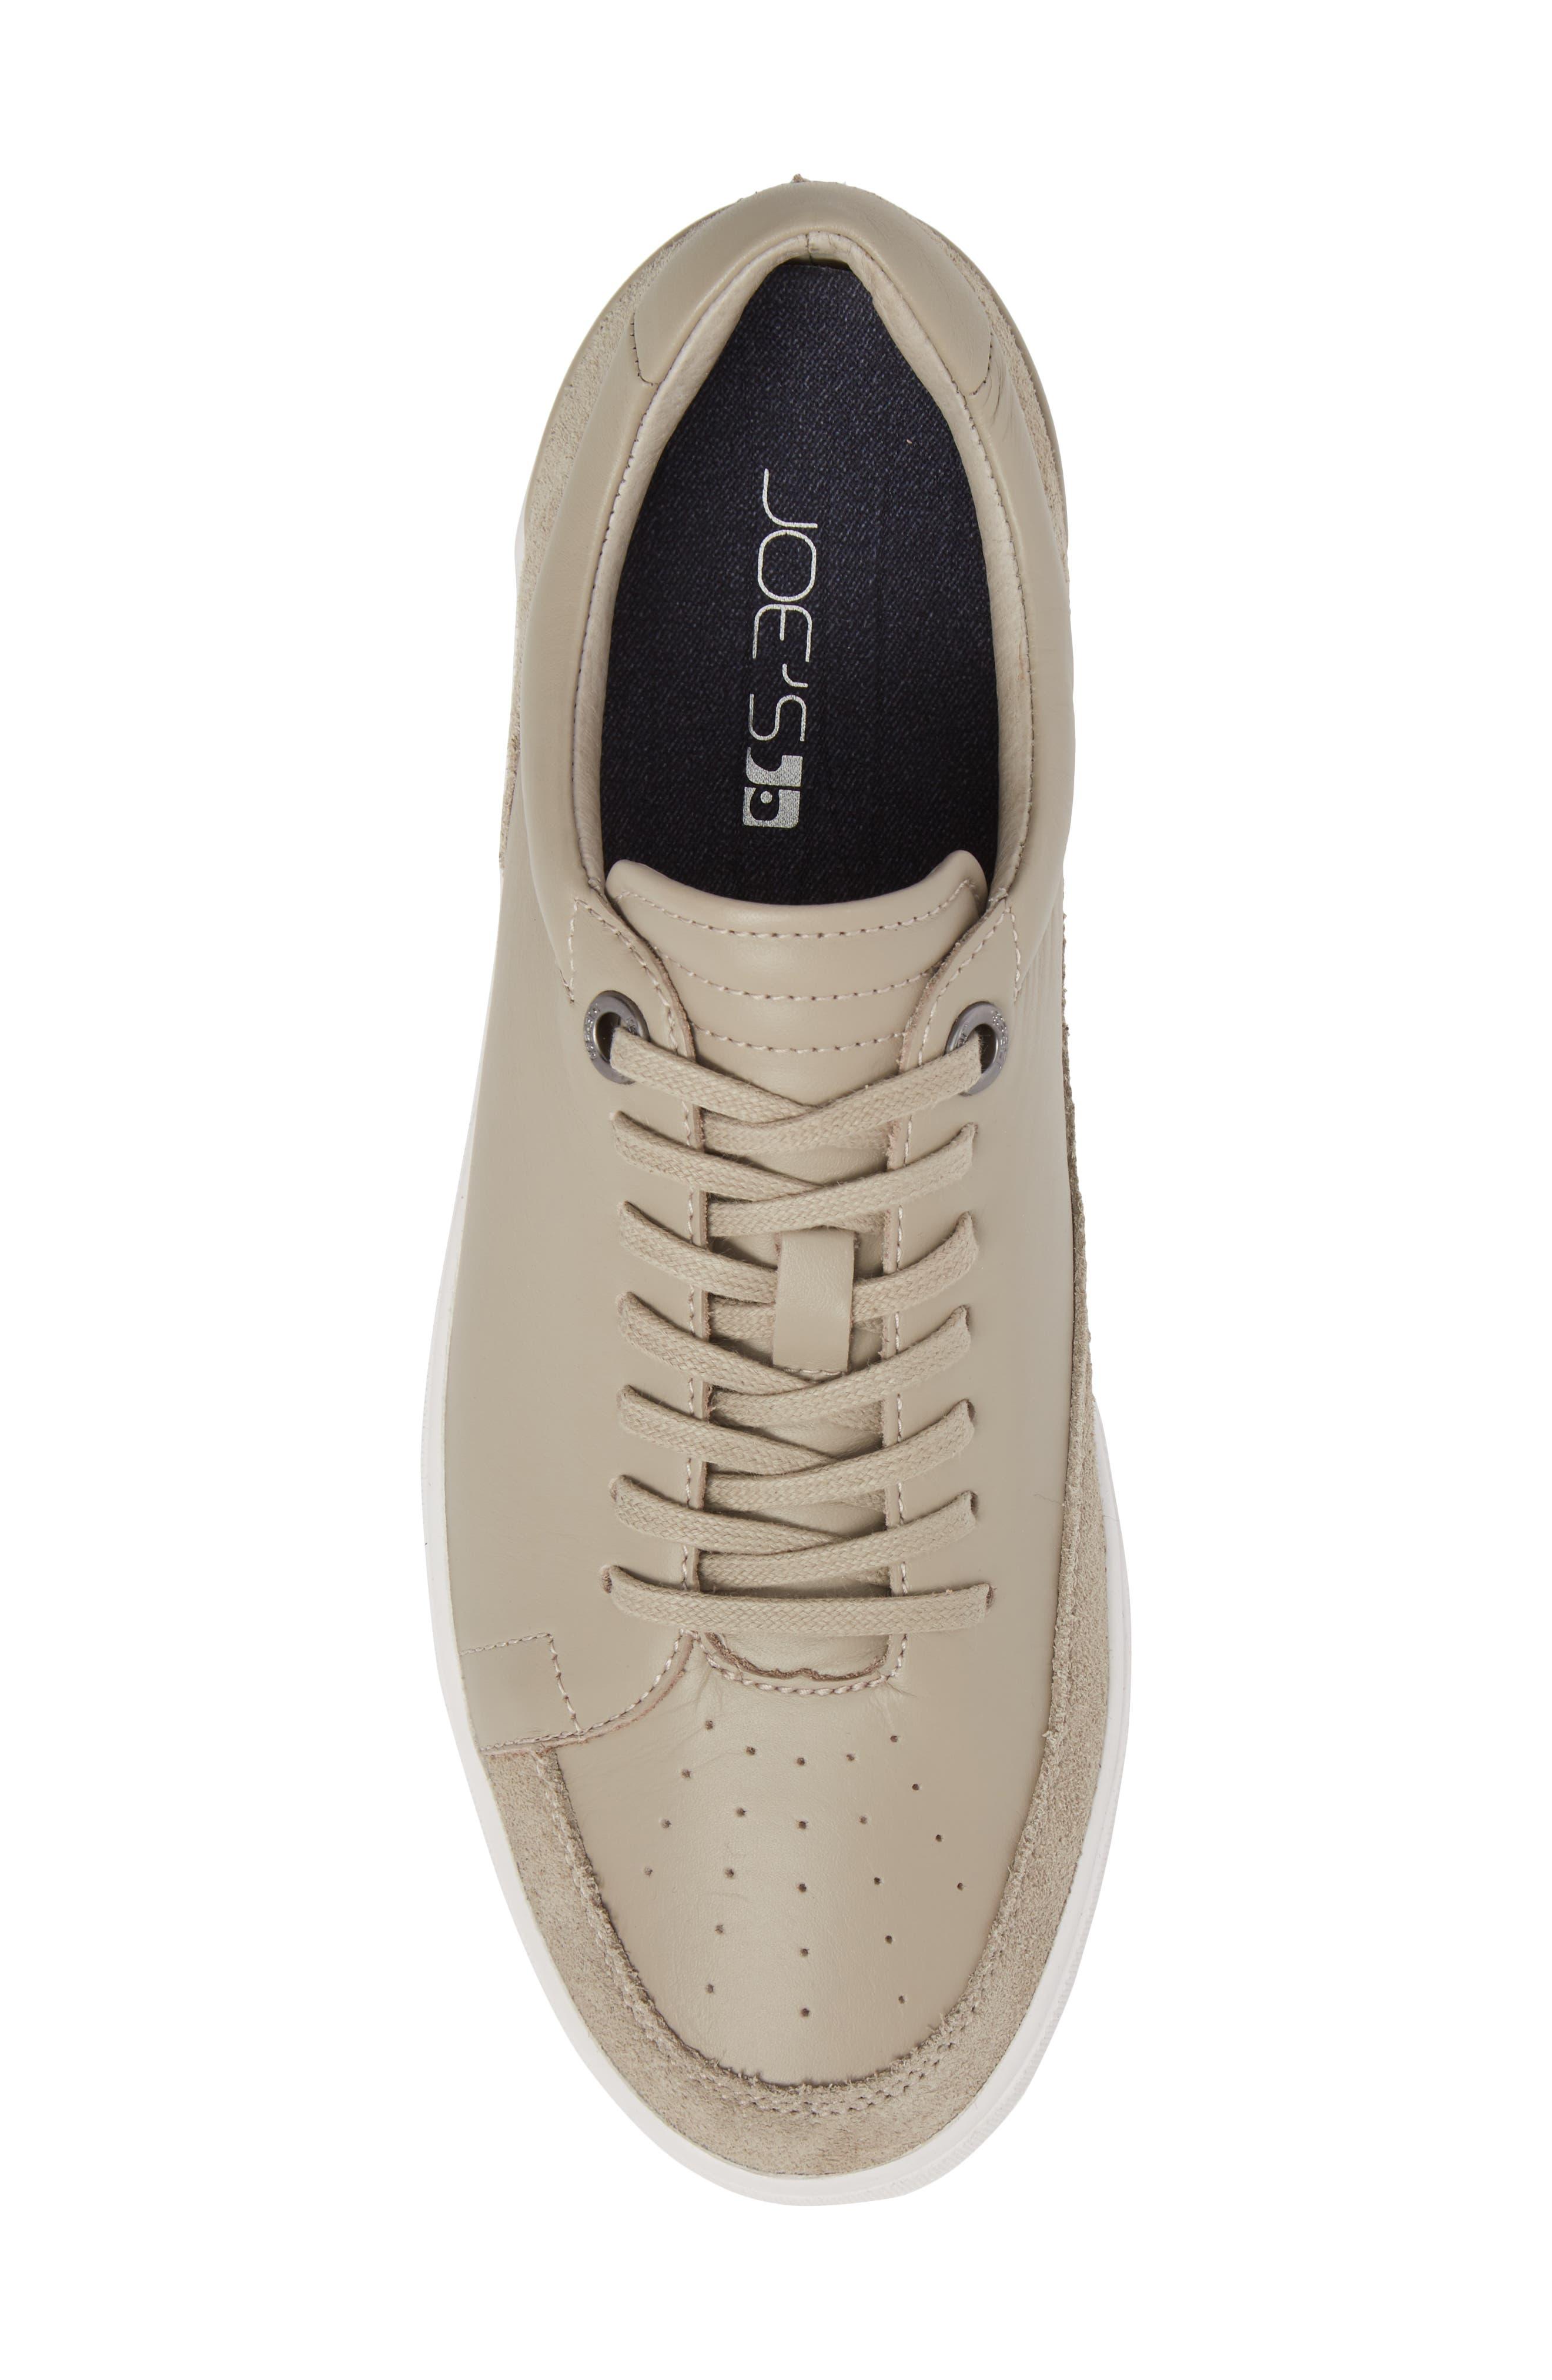 Joe Classic Low Top Sneaker,                             Alternate thumbnail 5, color,                             Stone Leather